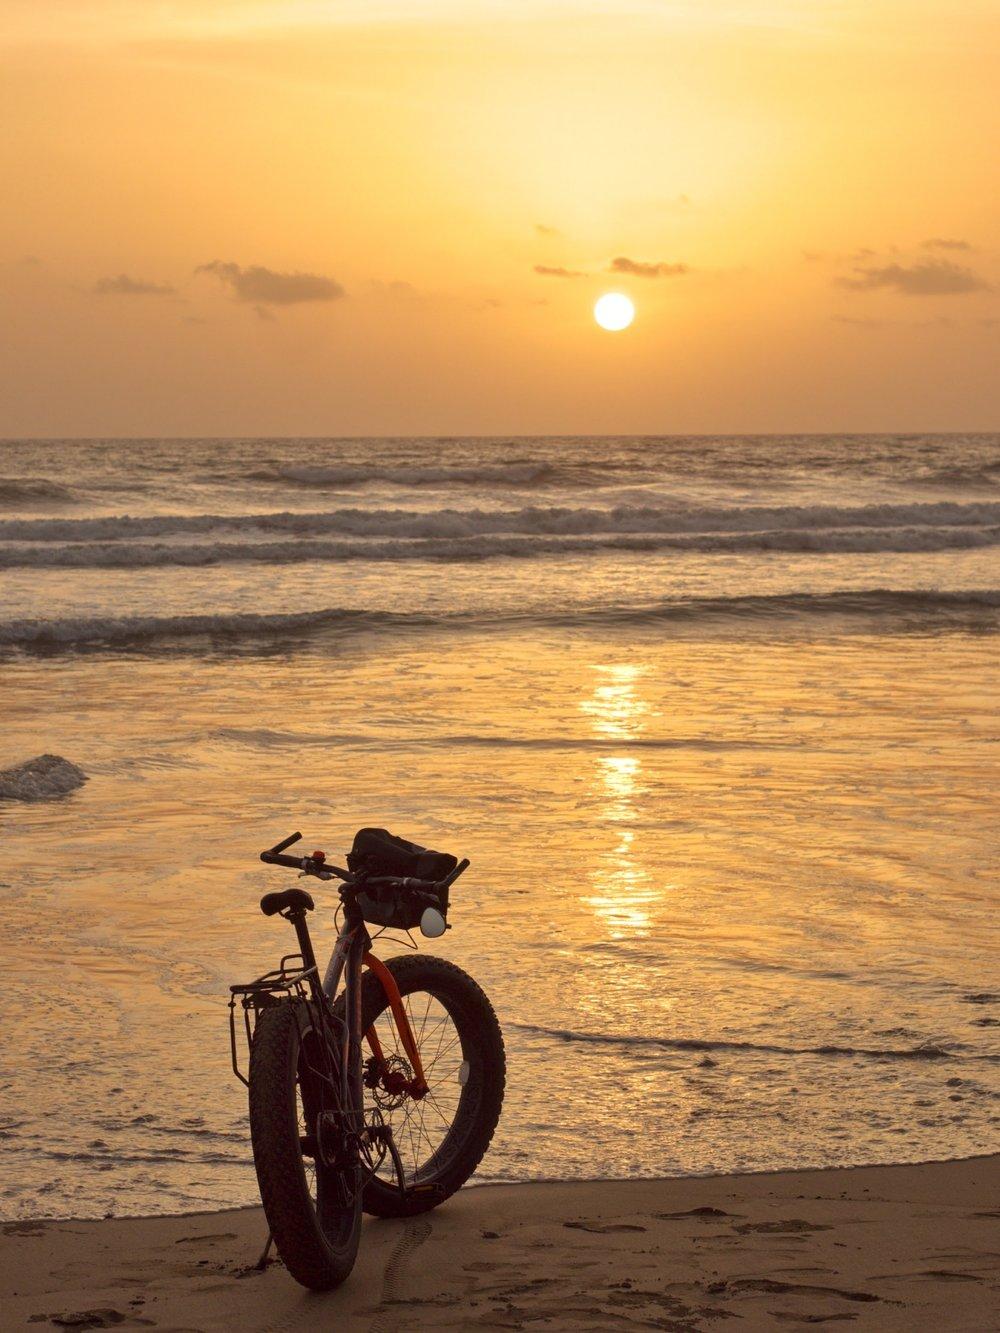 Fittrip Marine Fatbike Review India Konkan Bicycle Touring Bikepacking 2.jpeg